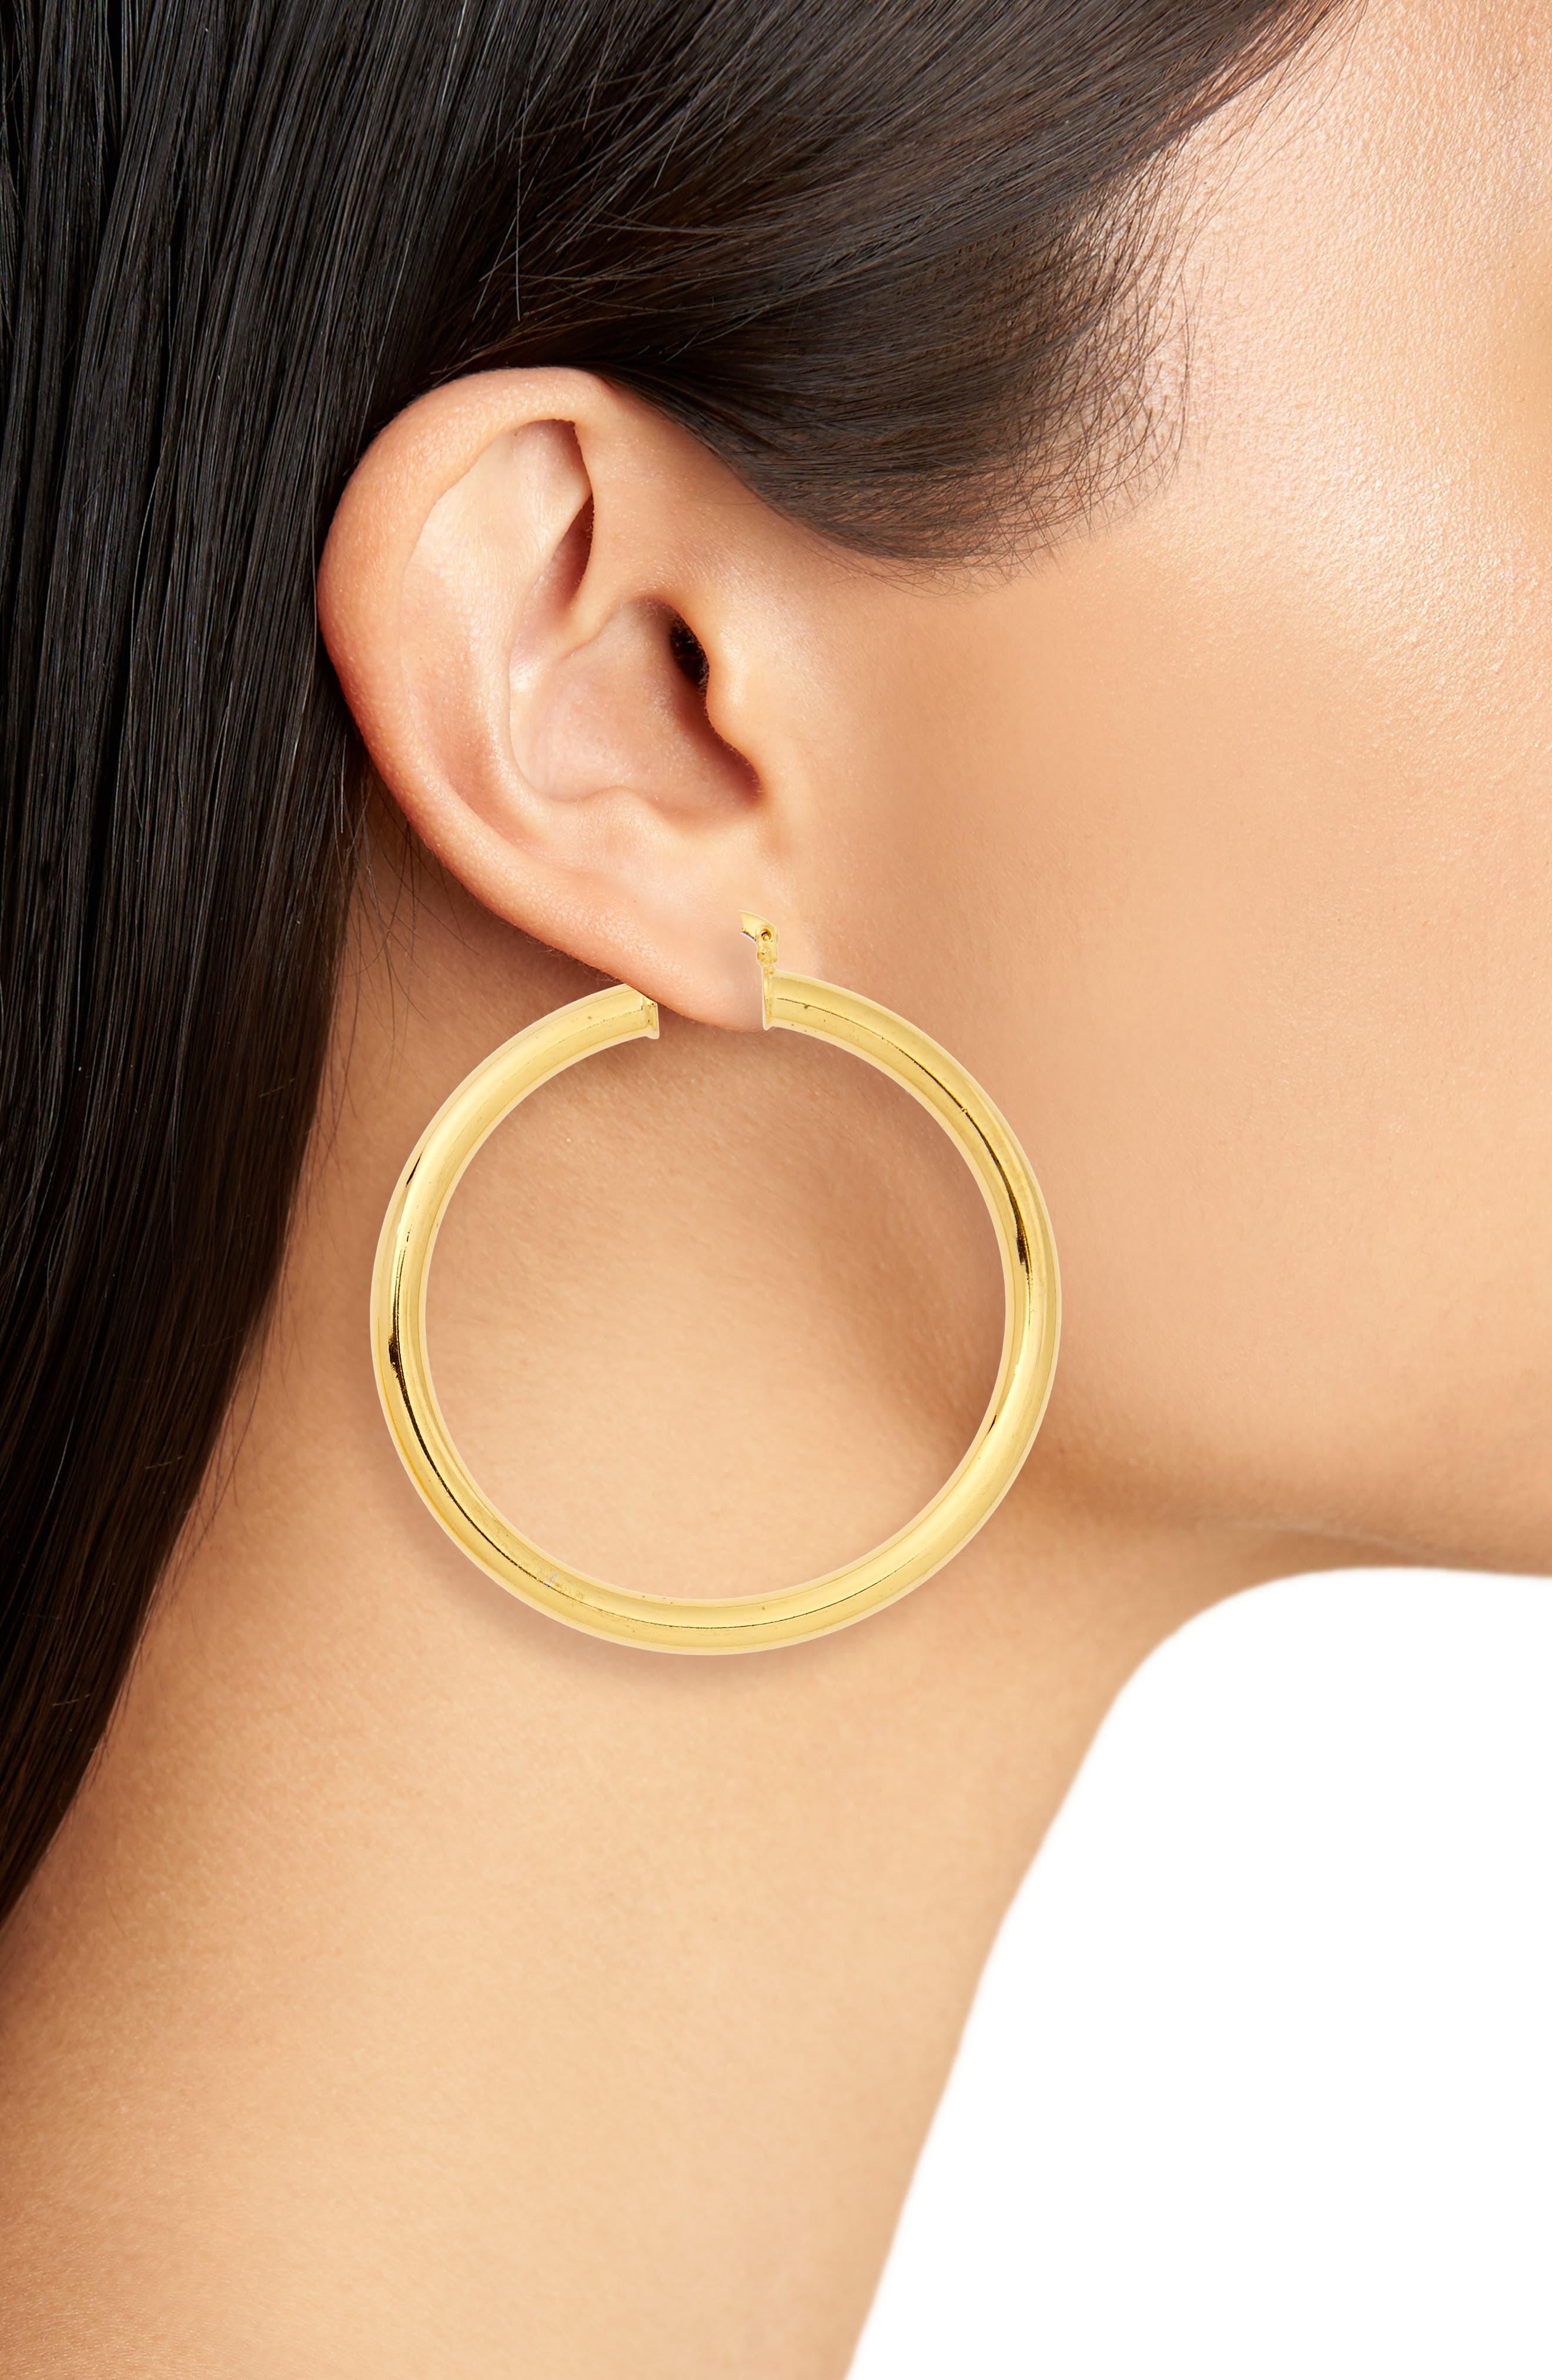 Sade Large Hoop Earrings,                             Alternate thumbnail 2, color,